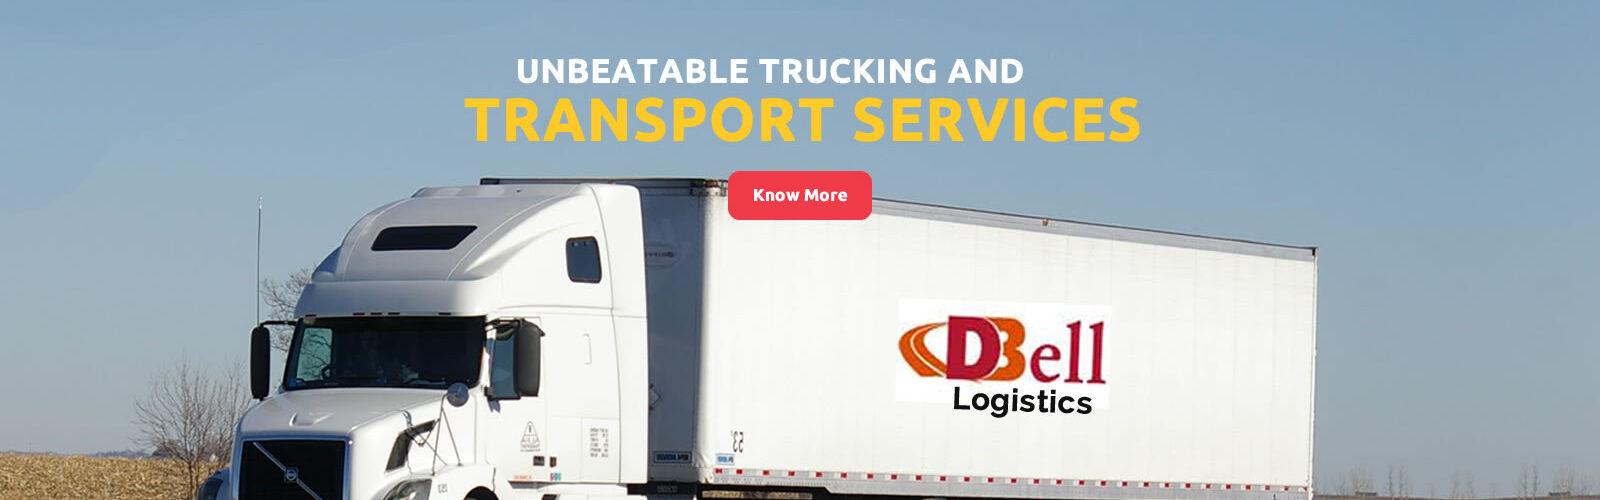 Dbell Logistics